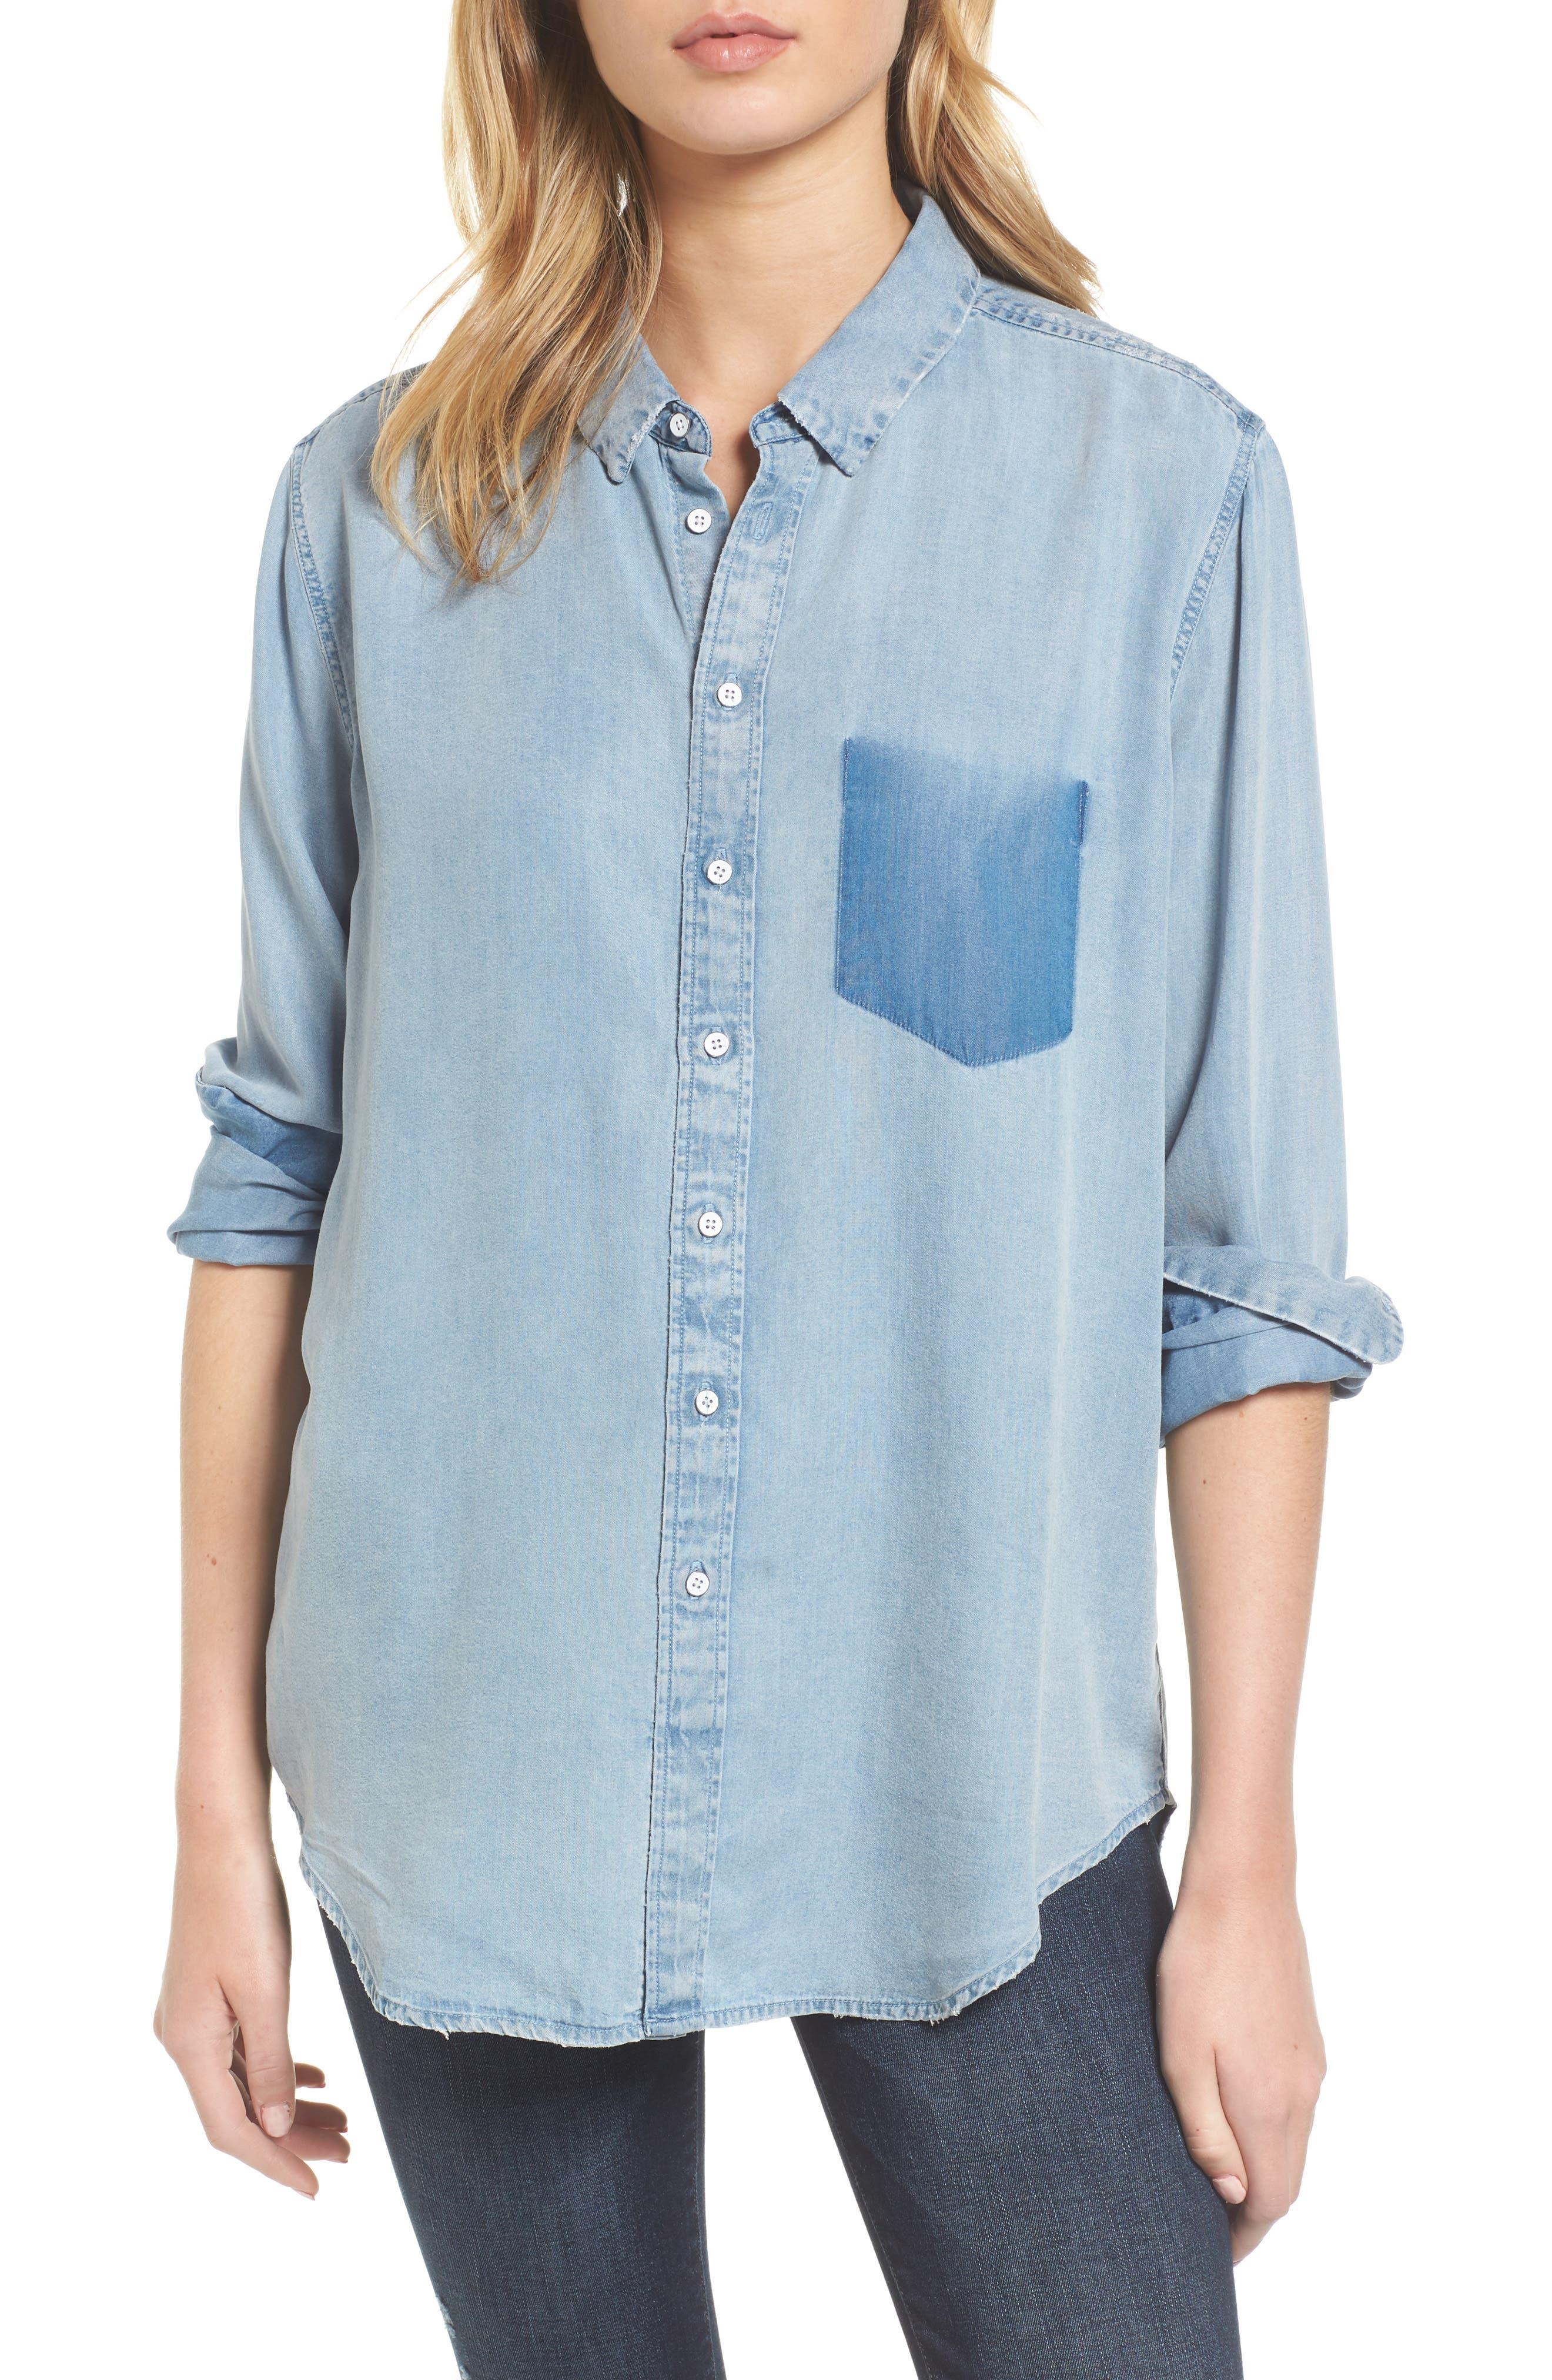 x The Blue Shirt Shop Nassau & Manhattan Boyfriend Shirt,                             Main thumbnail 1, color,